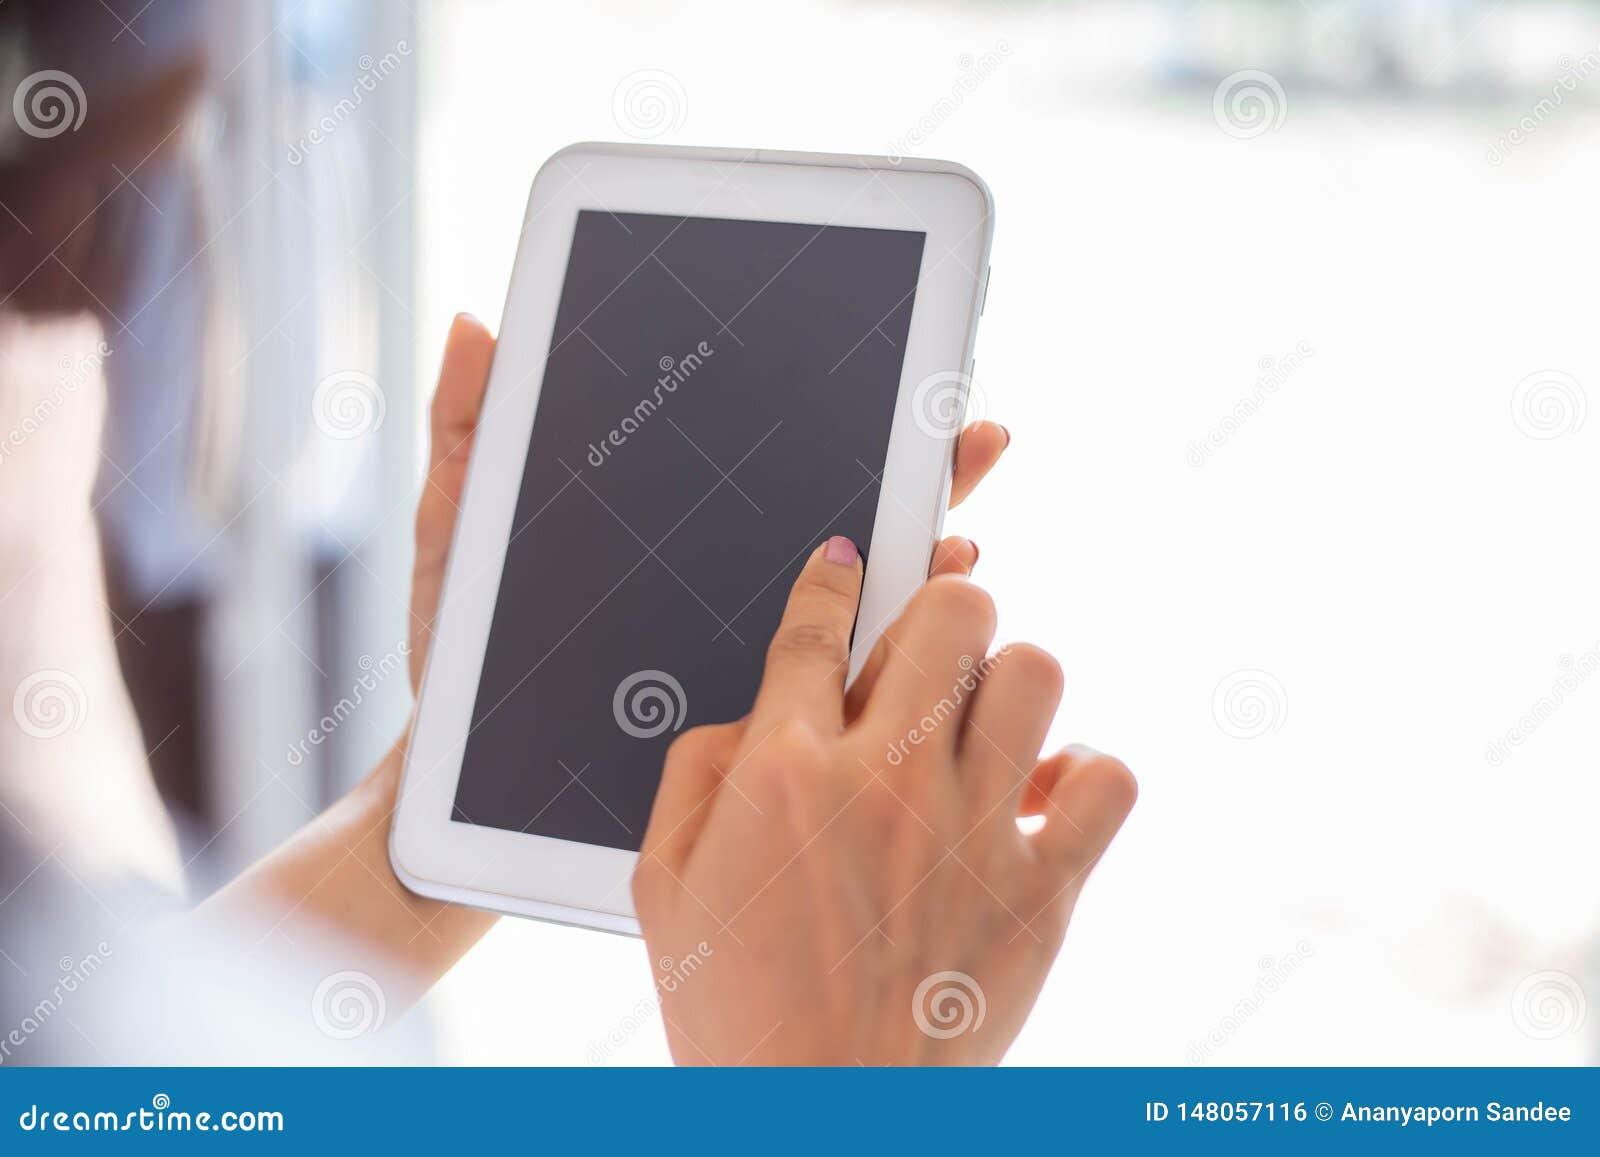 Cute child is using digital tablet